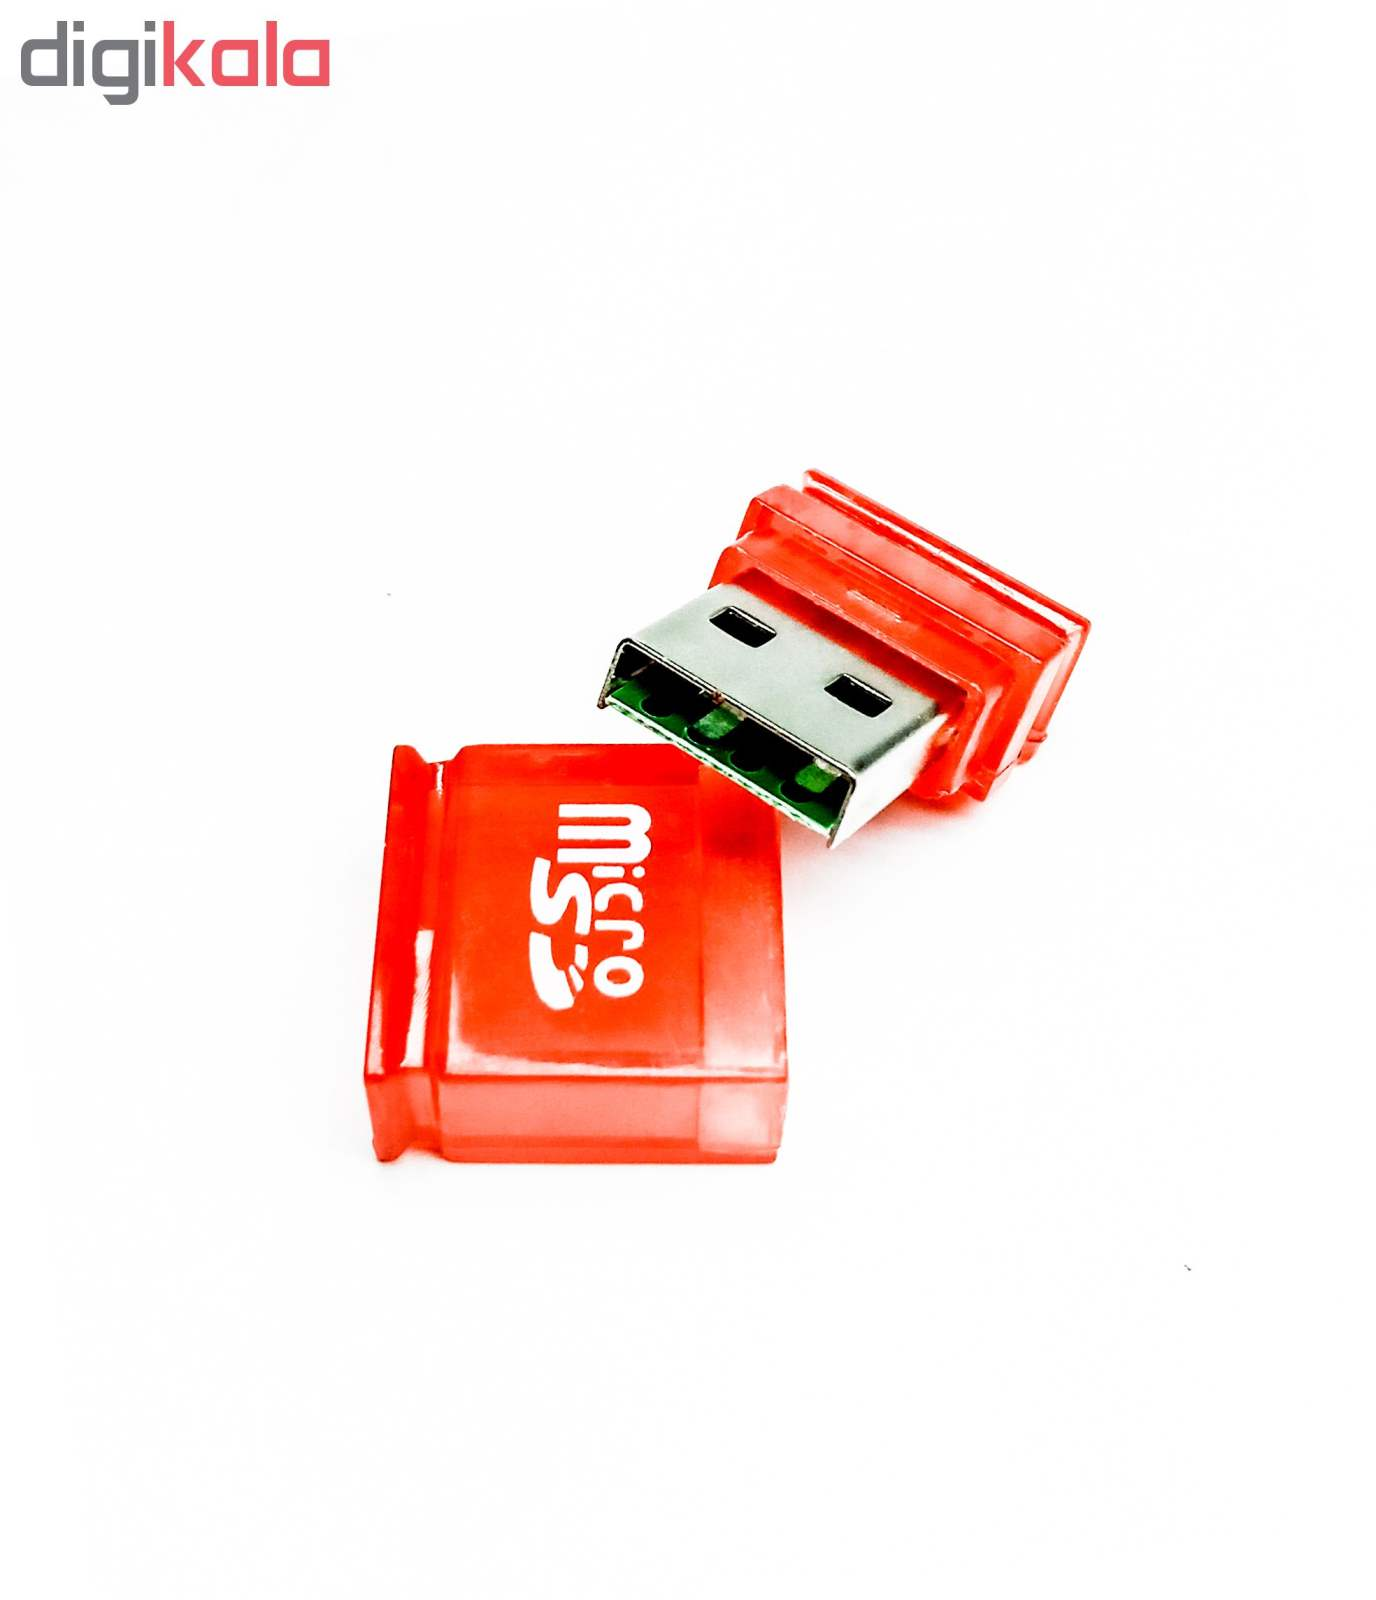 کارت خوان مدل MO02 main 1 2